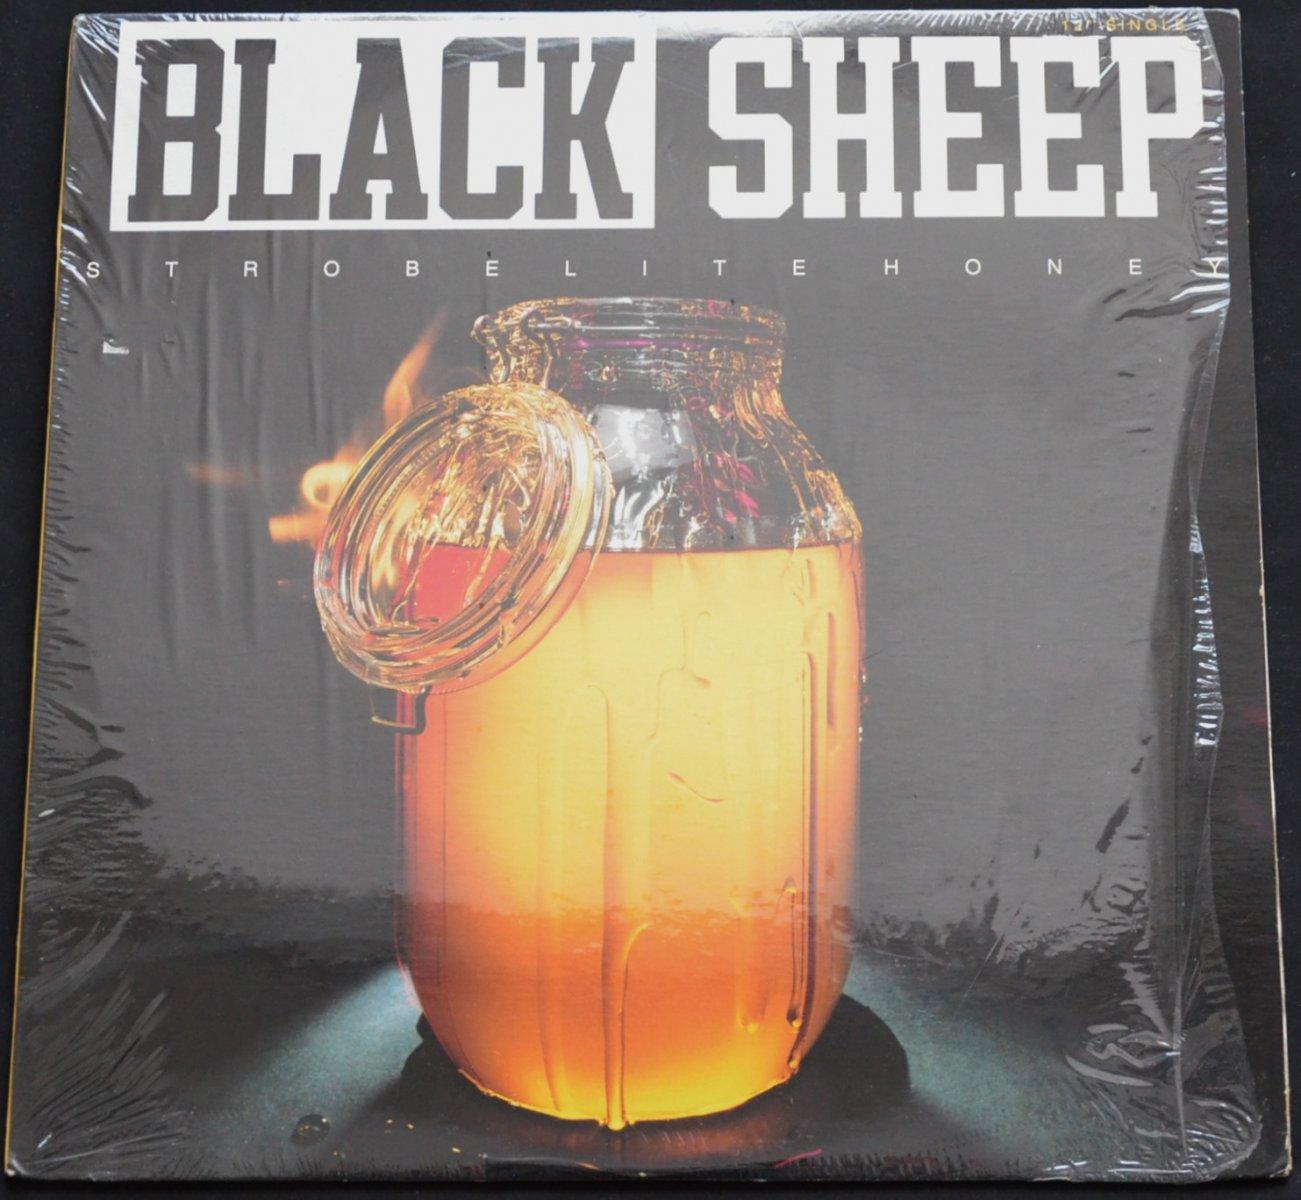 BLACK SHEEP / STROBELITE HONEY / GIMME THE FINGA - REMIX (12